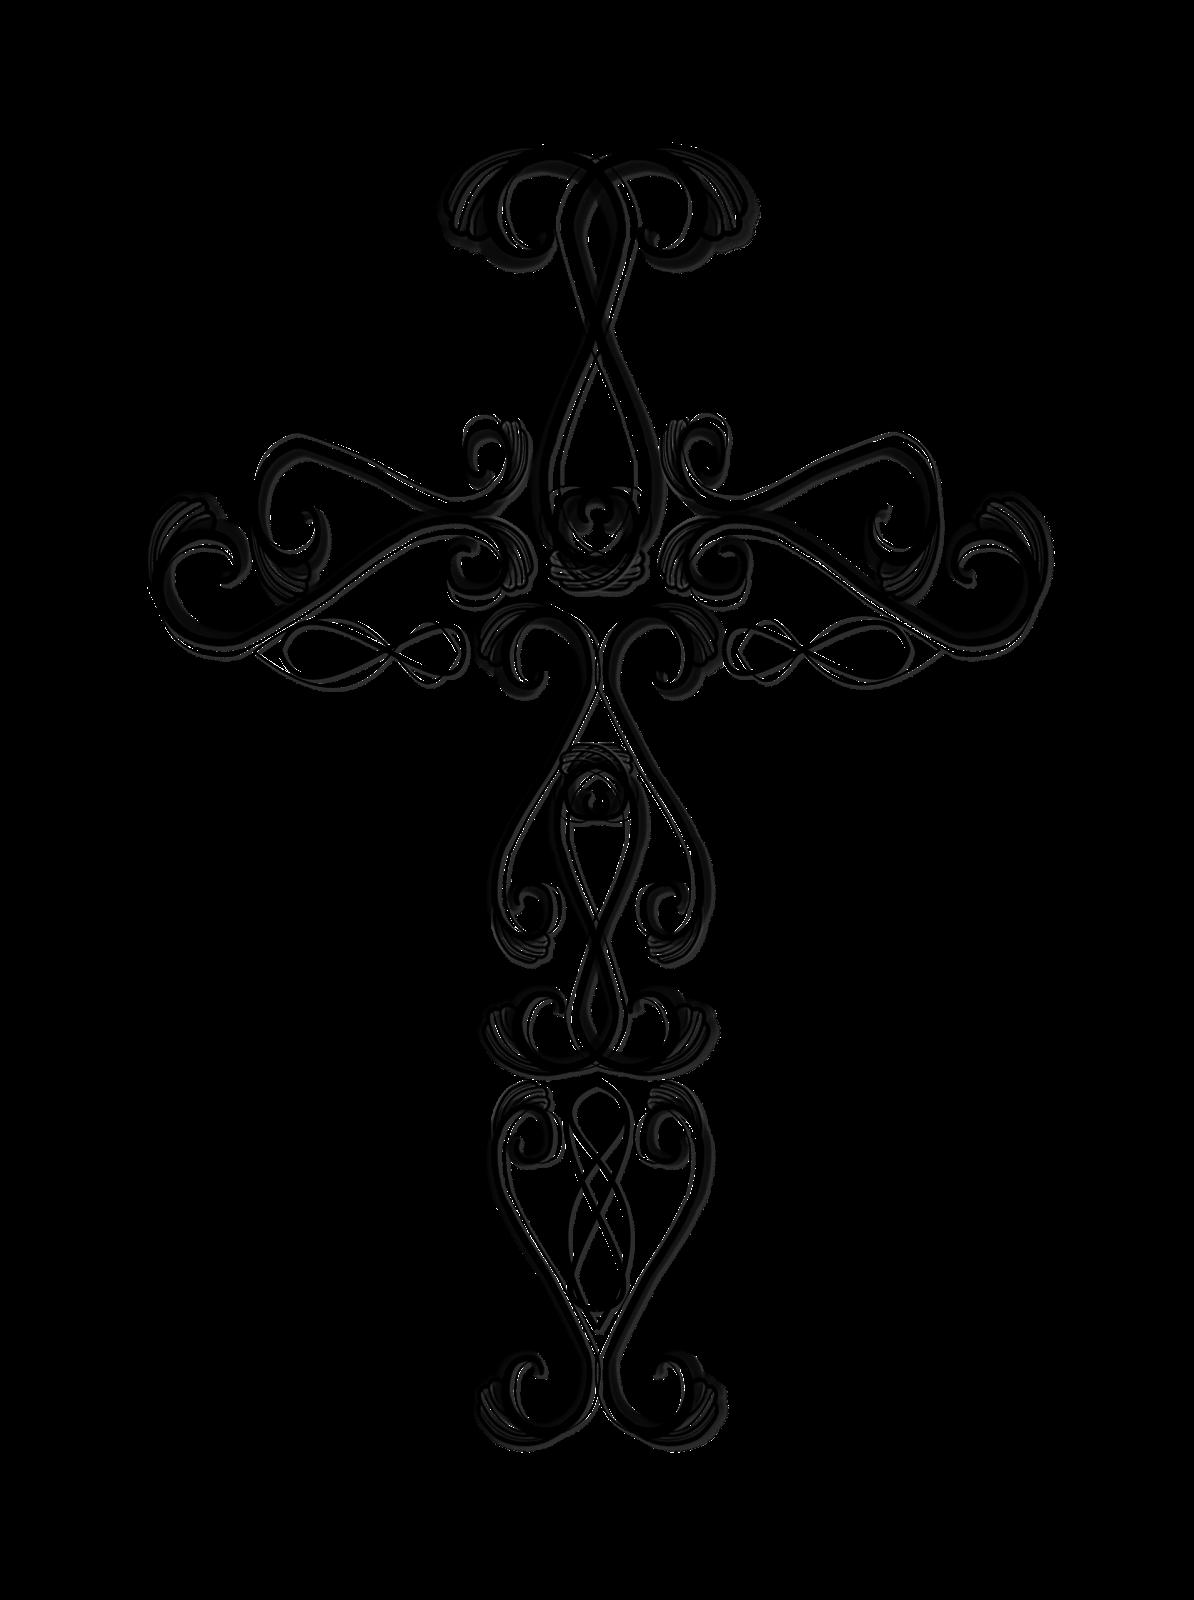 1194x1600 Crosses Vector Cross Tattoo Transparent Png Clipart Free